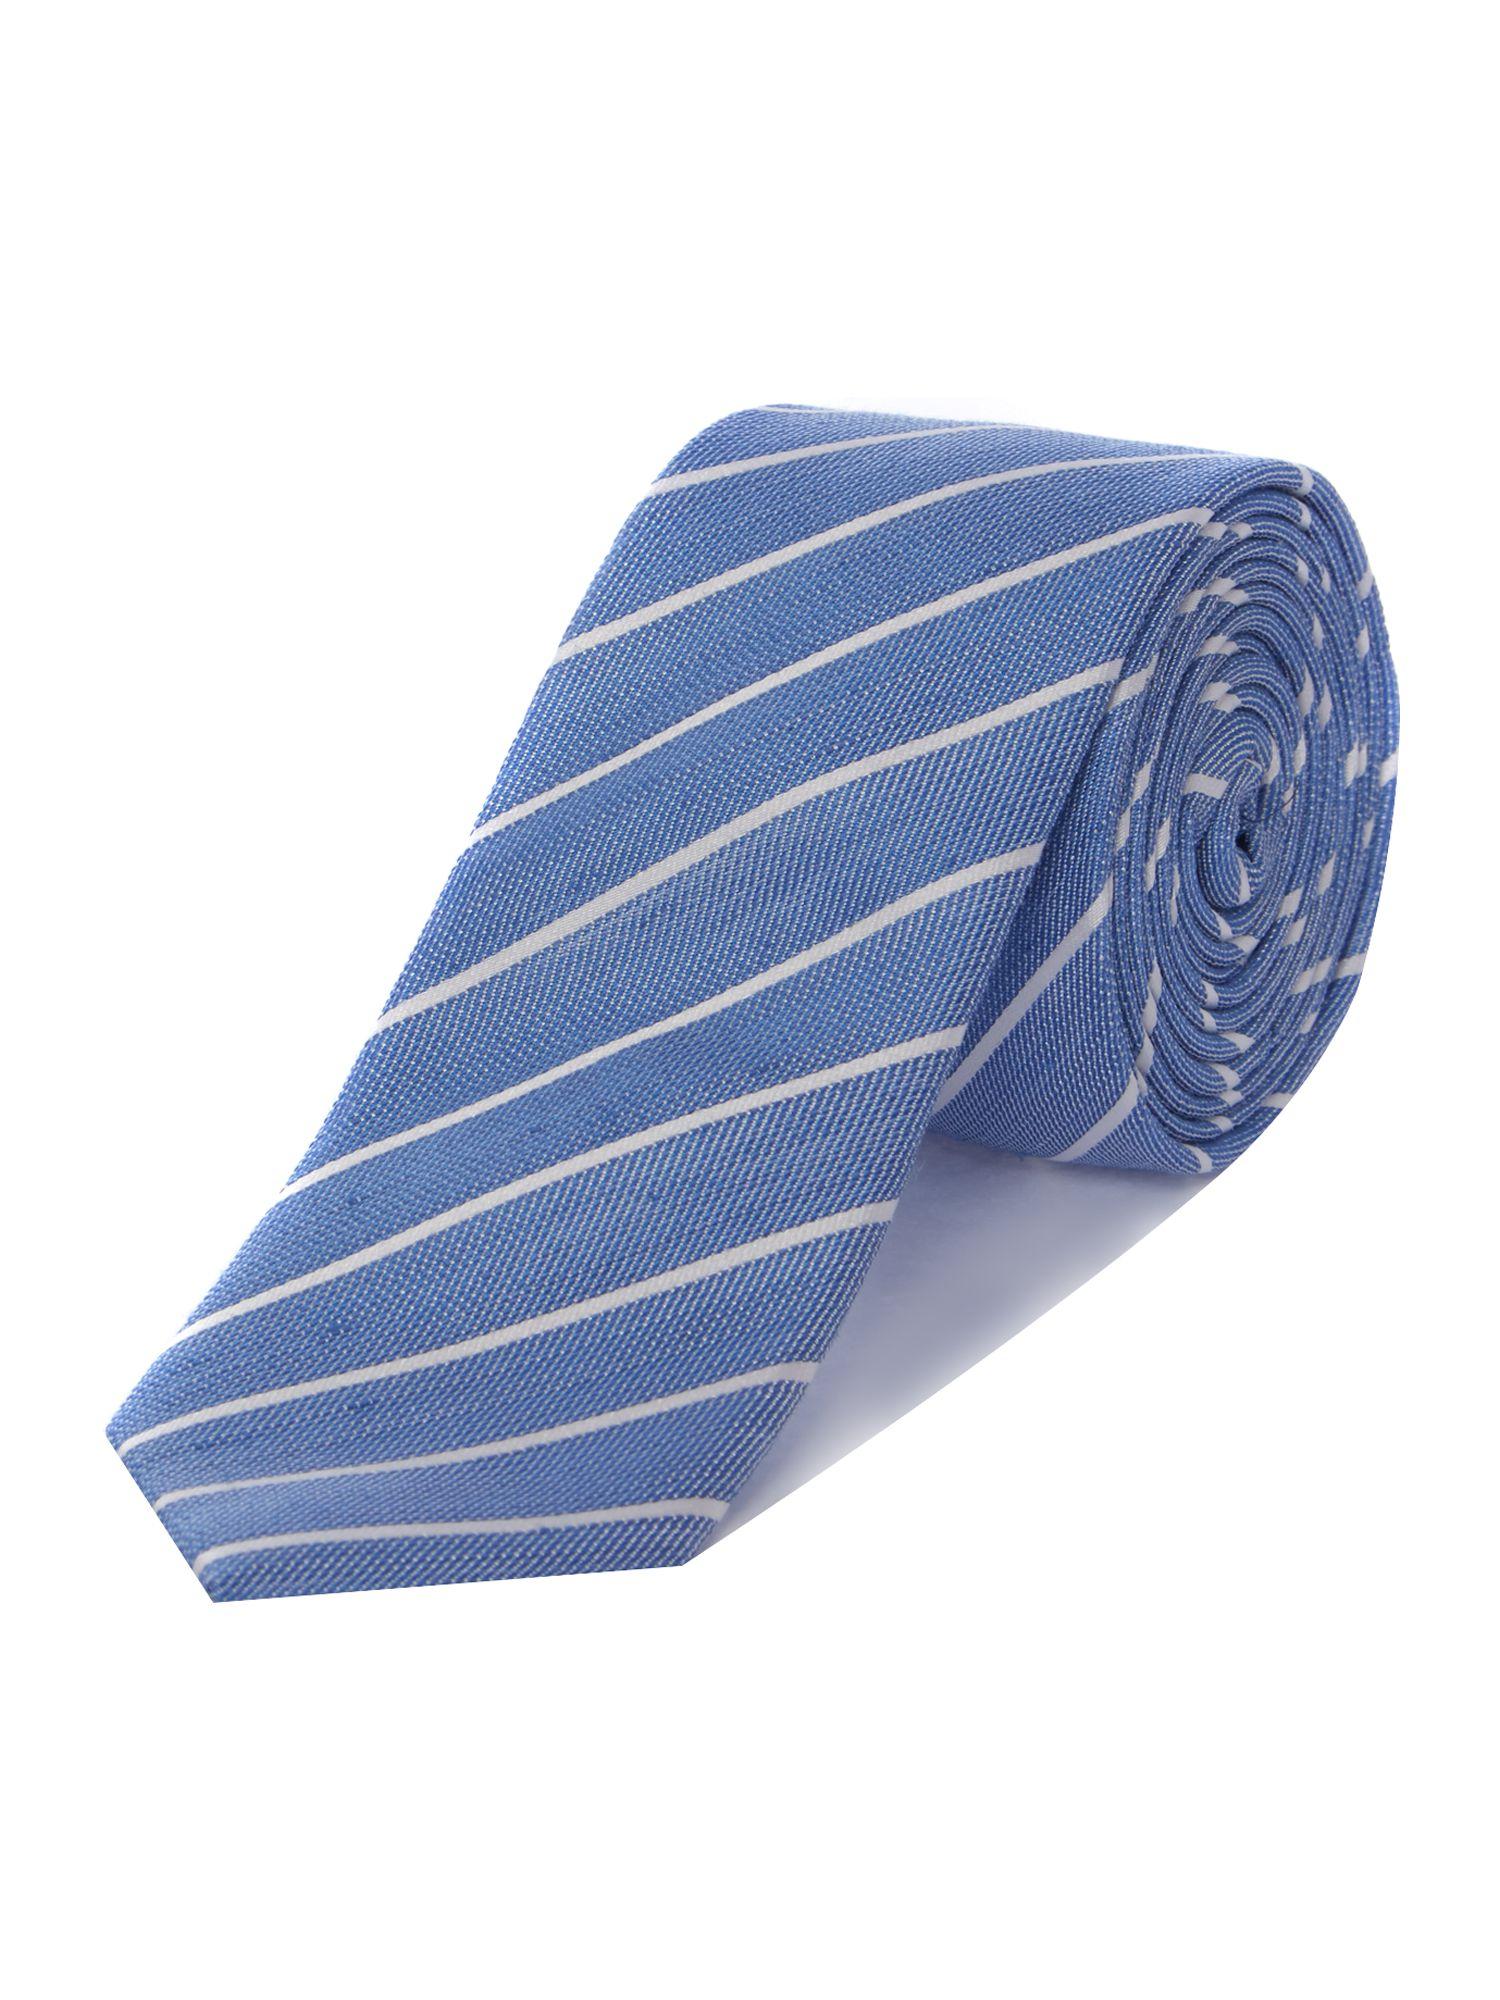 57e3554cdcf4d8 Ted Baker Tighta Striped Tie in Blue for Men - Lyst